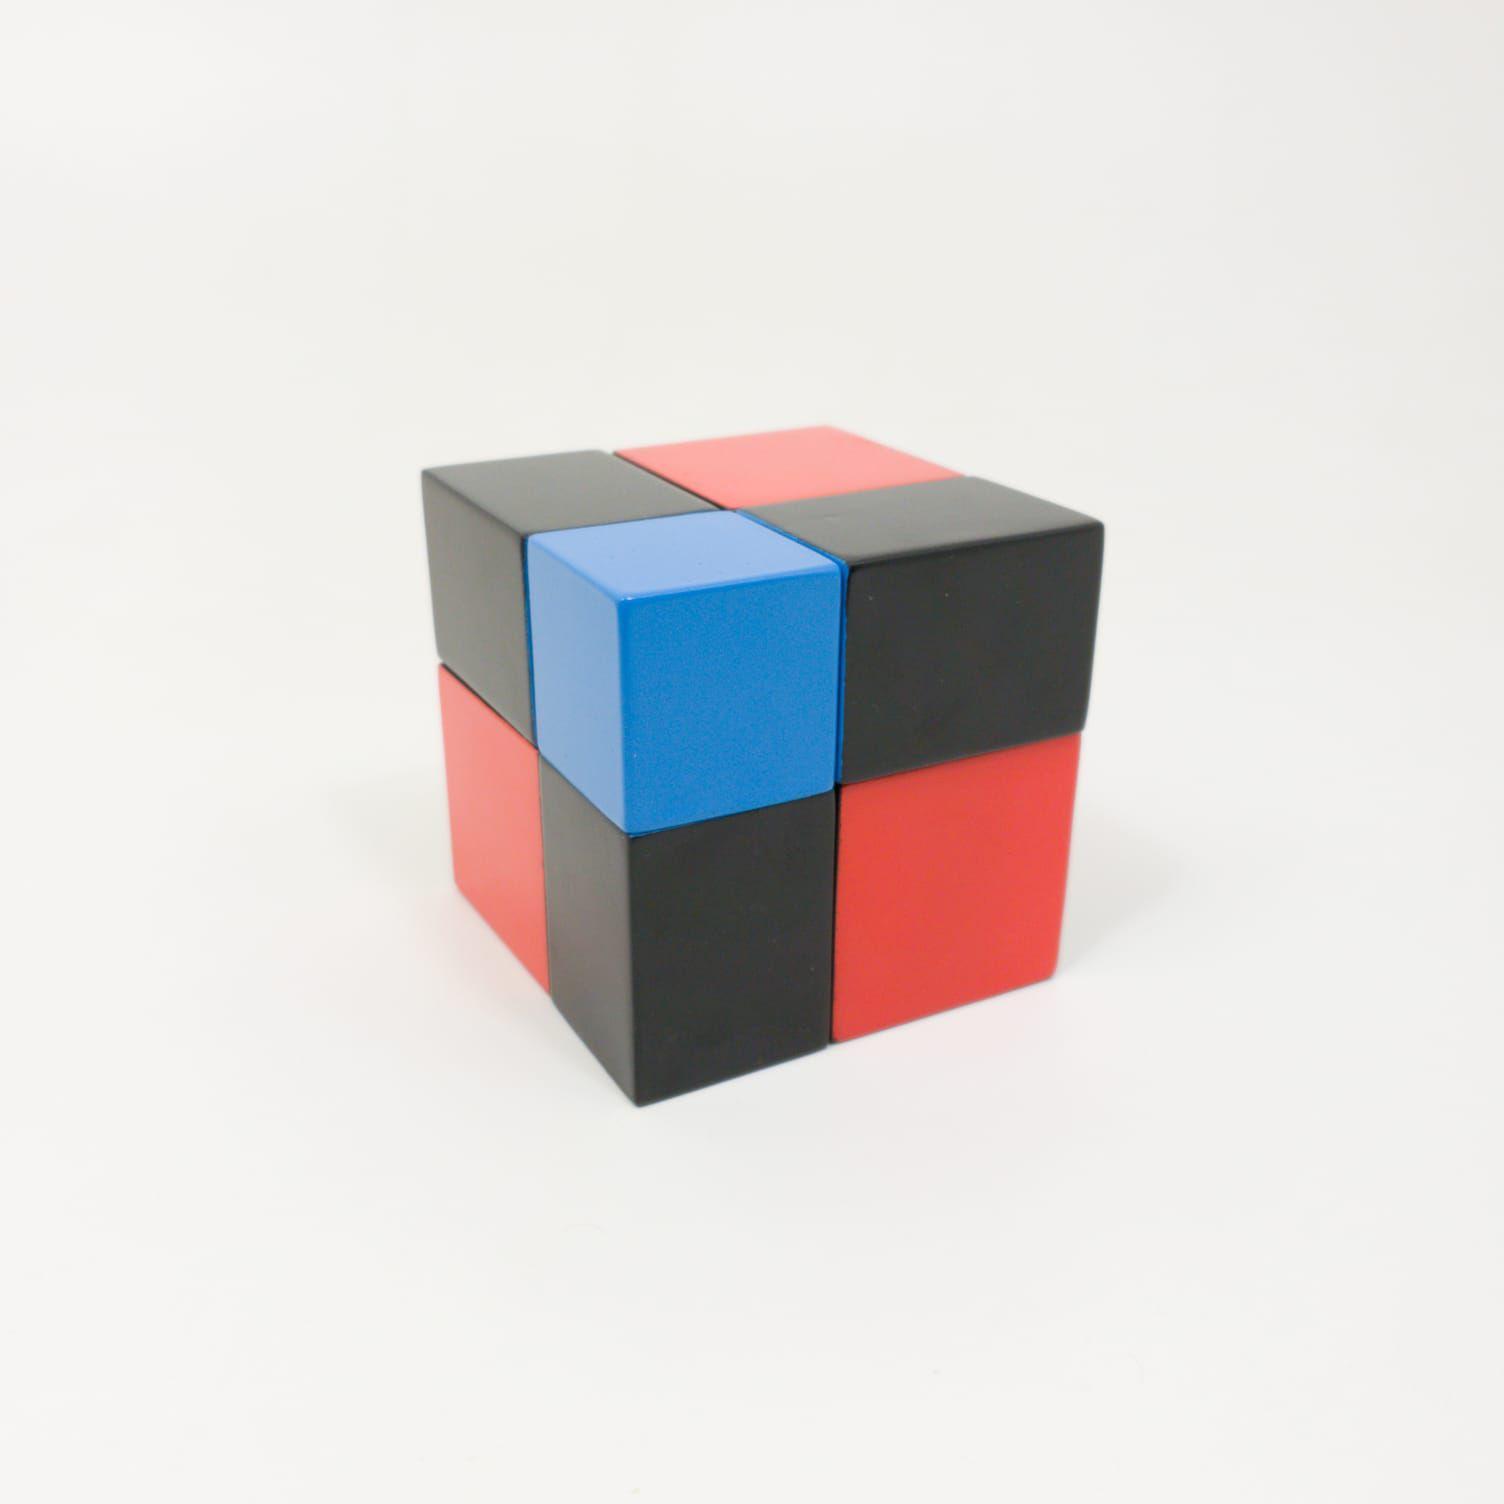 Cubo do Binômio